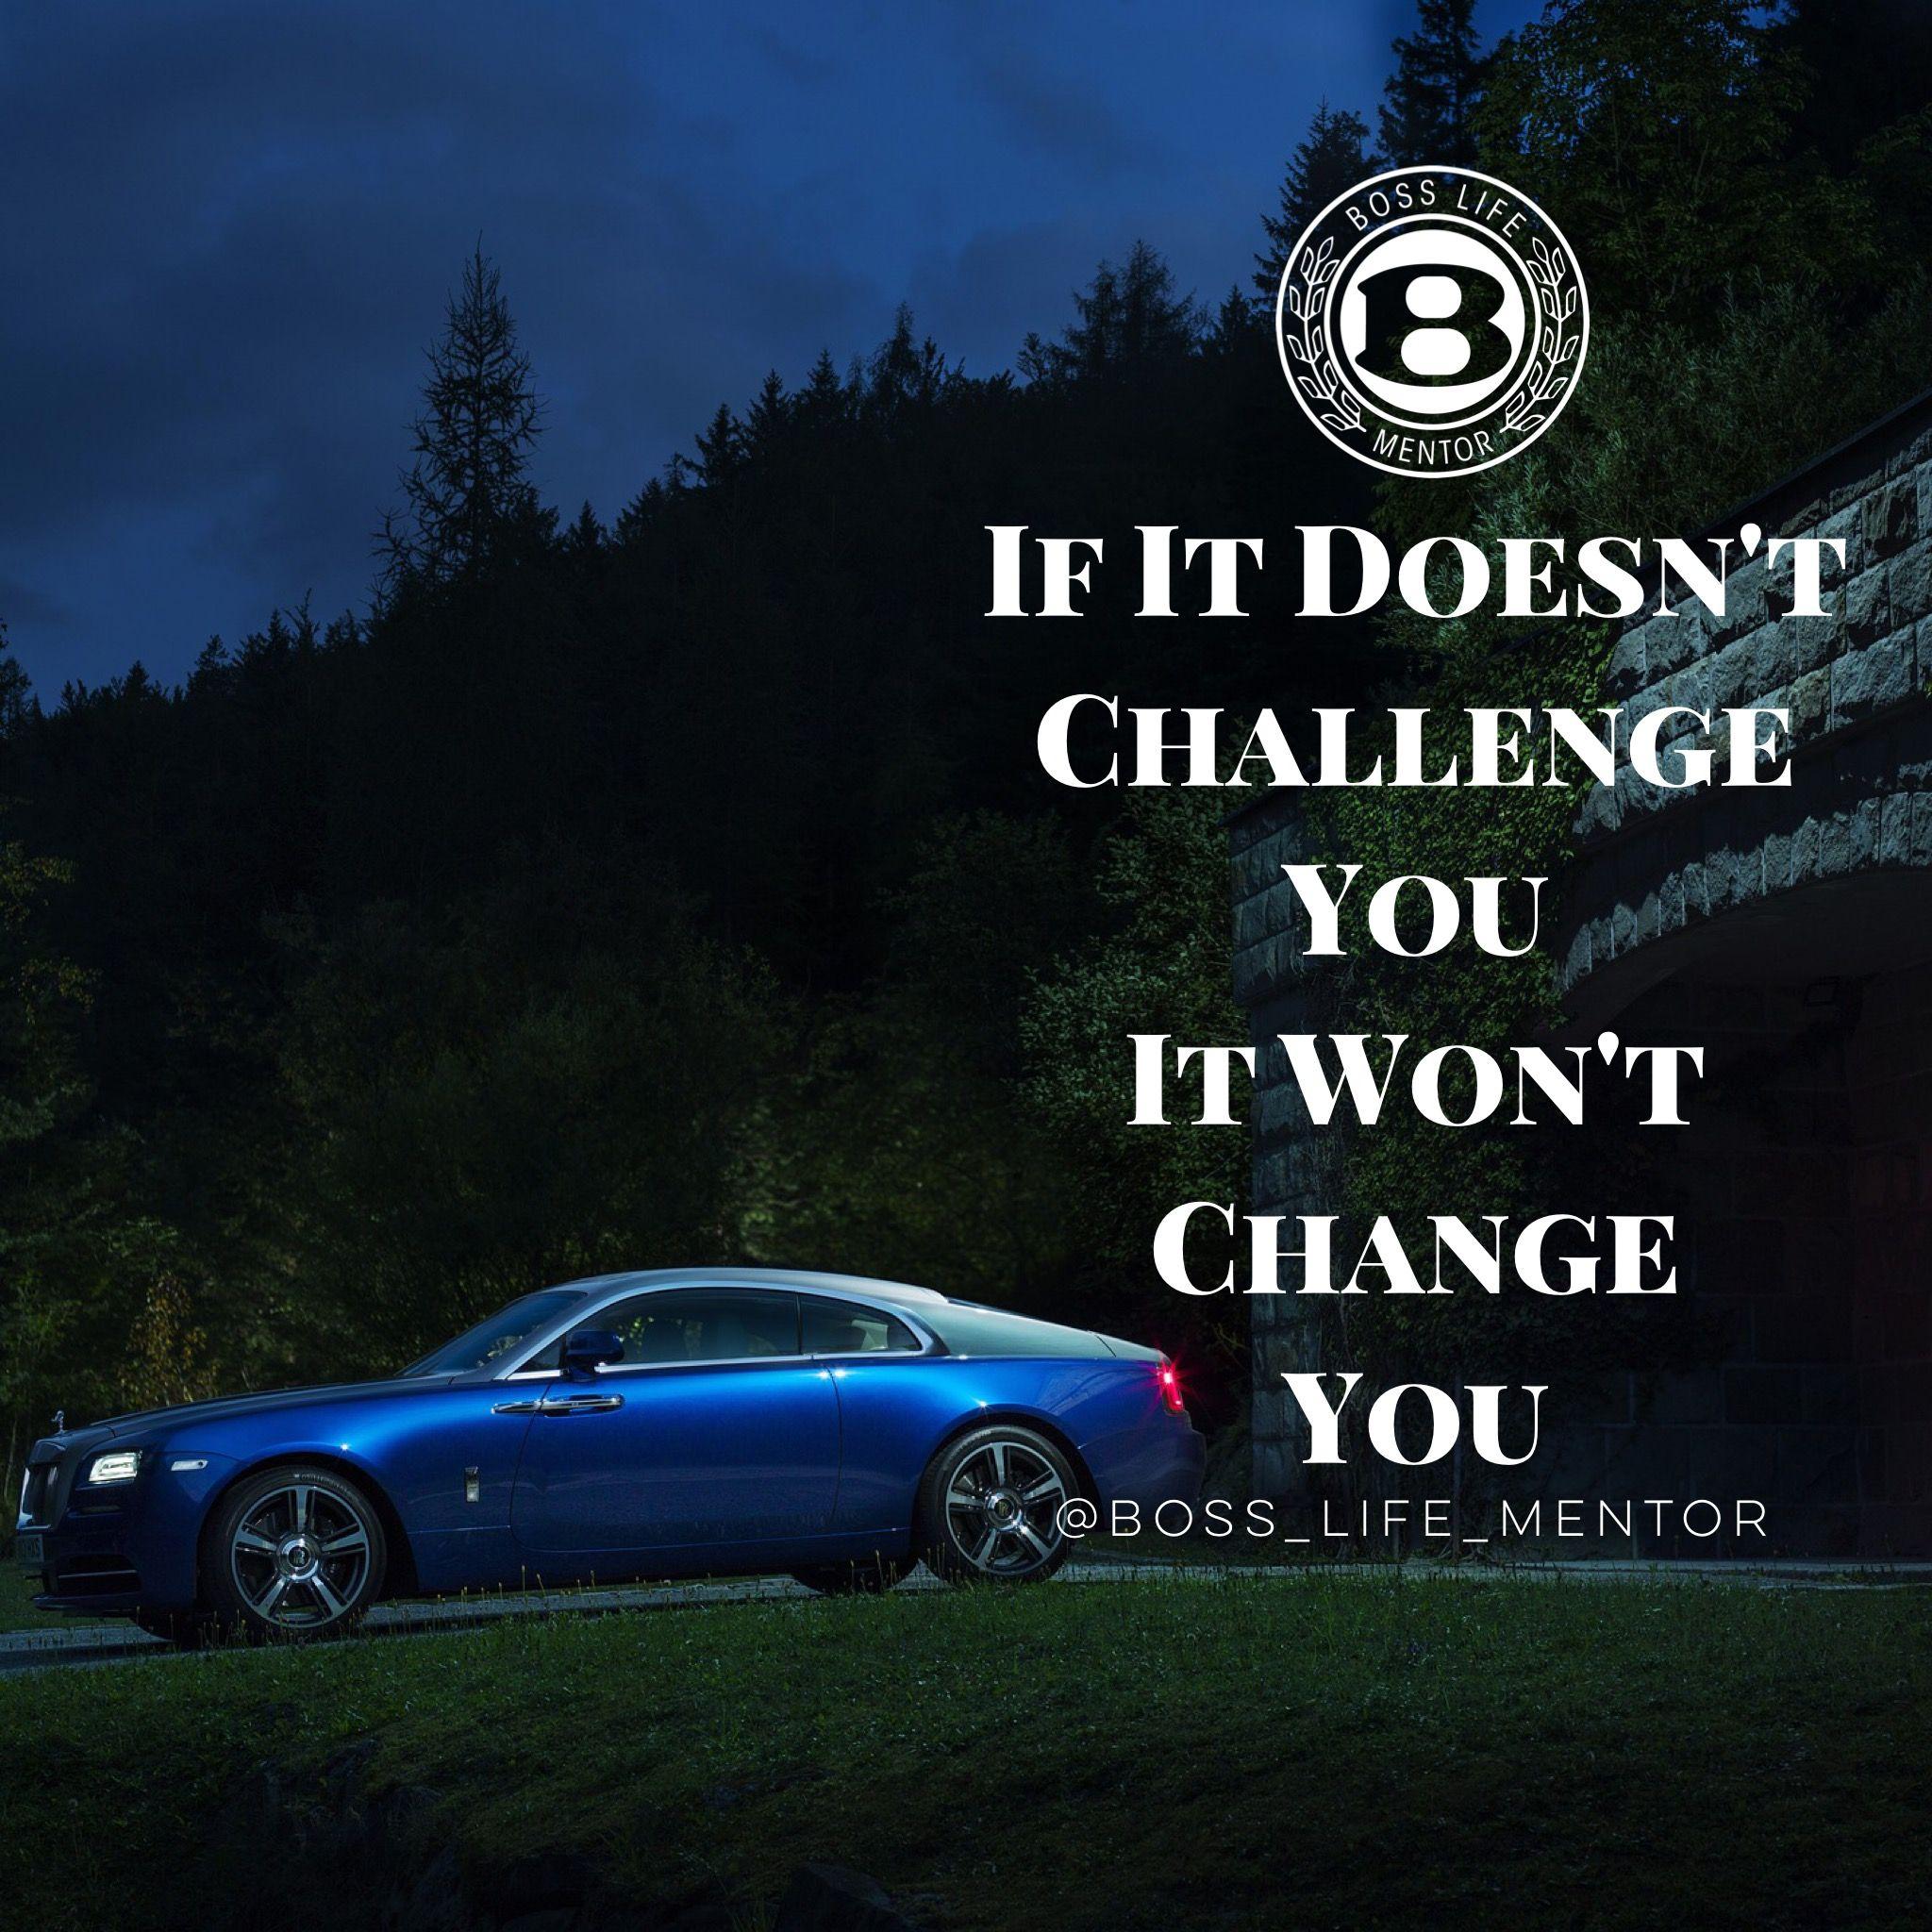 Quotes, quote, millionaire, lifestyle, success